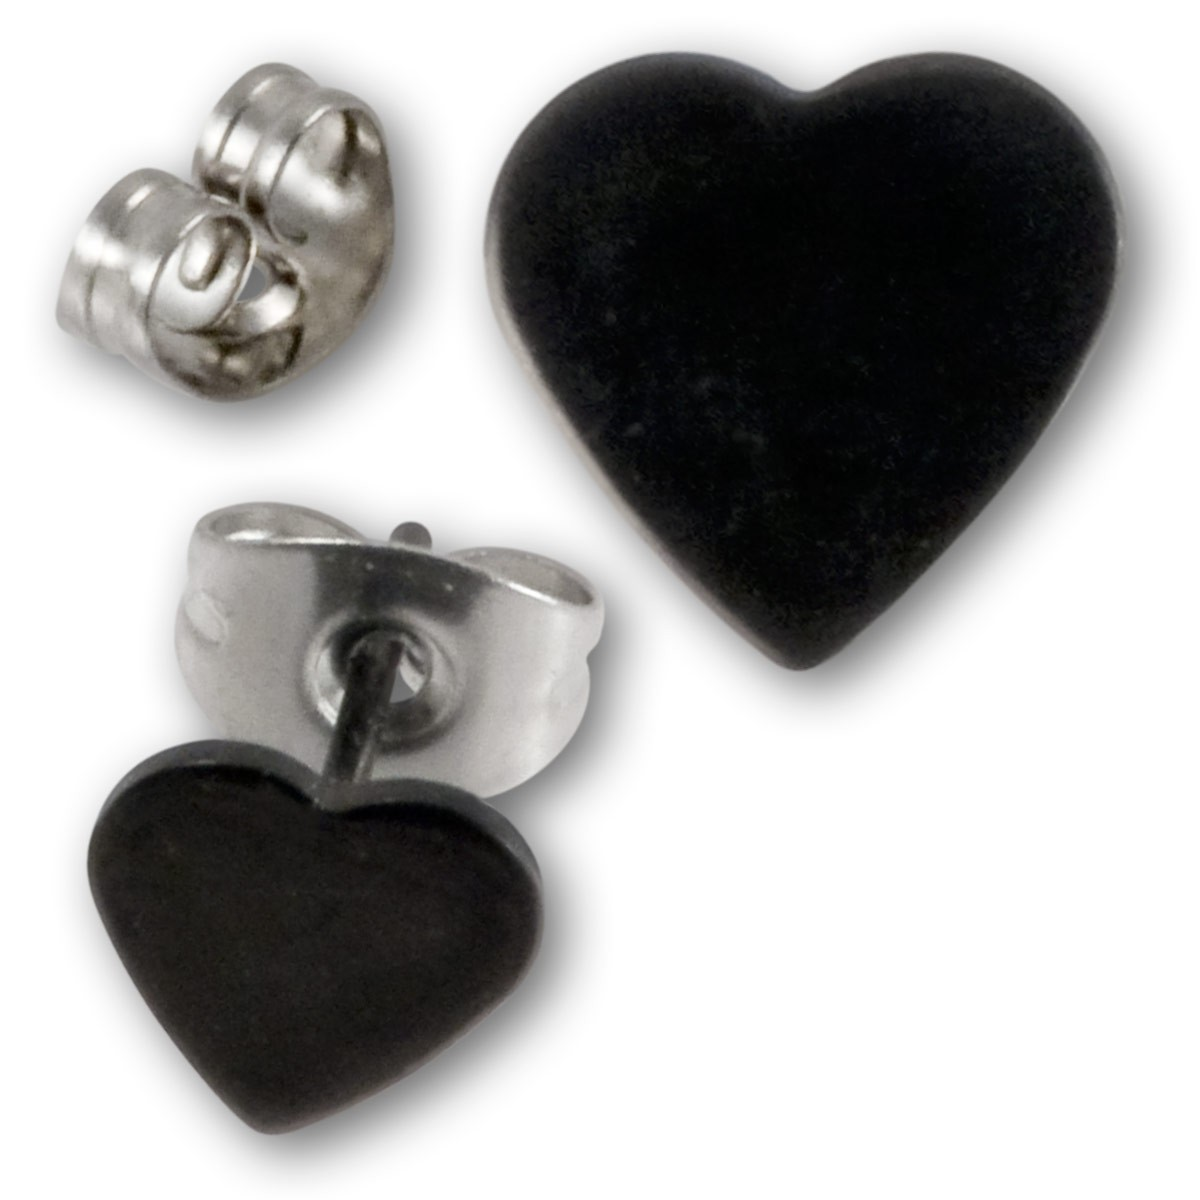 schwarze edelstahl ohrringe herzen ohrschmuck ohrstecker. Black Bedroom Furniture Sets. Home Design Ideas